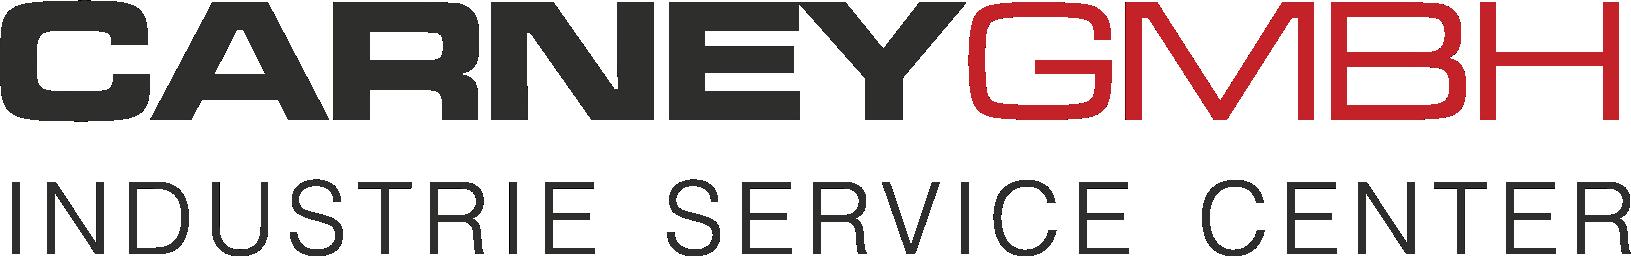 CARNEY GmbH